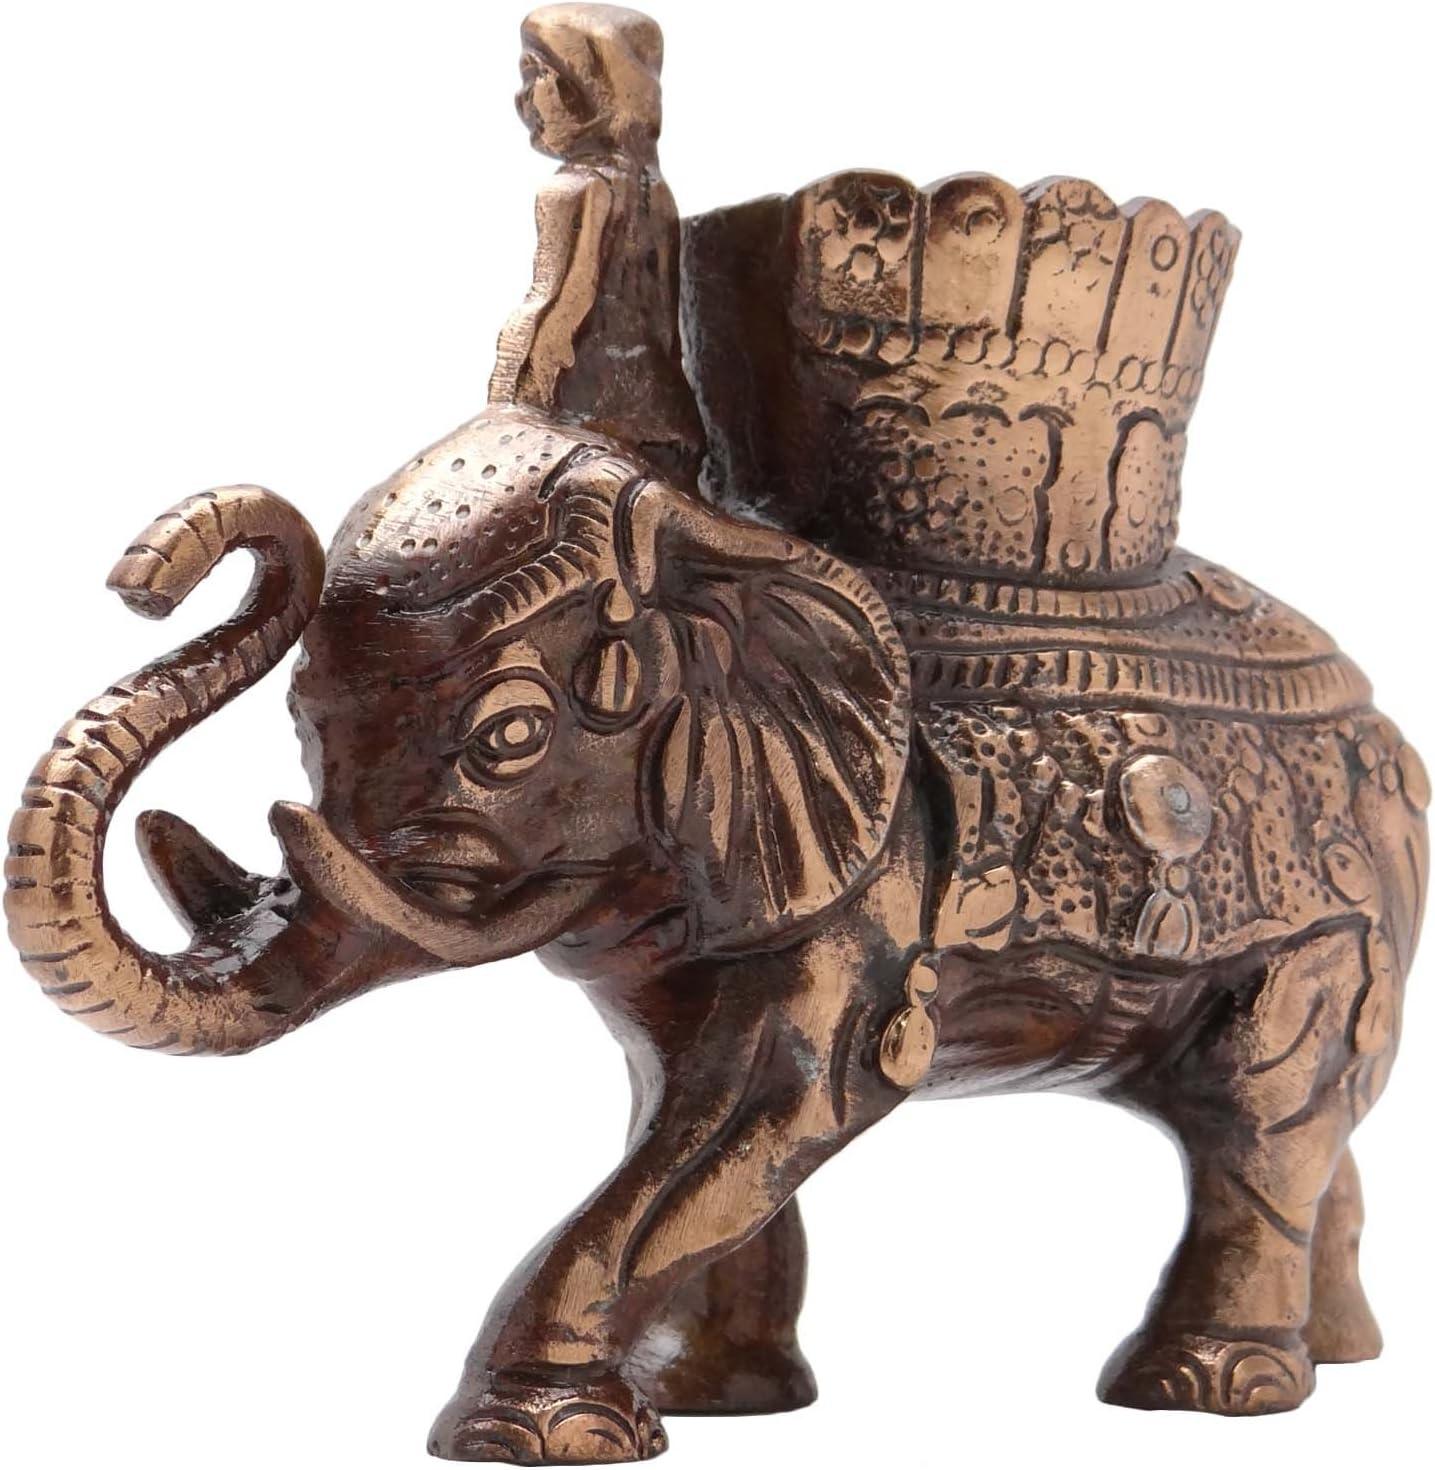 Ethnic Elephant Figurine Statueメタルアートホームテーブル装飾彫刻